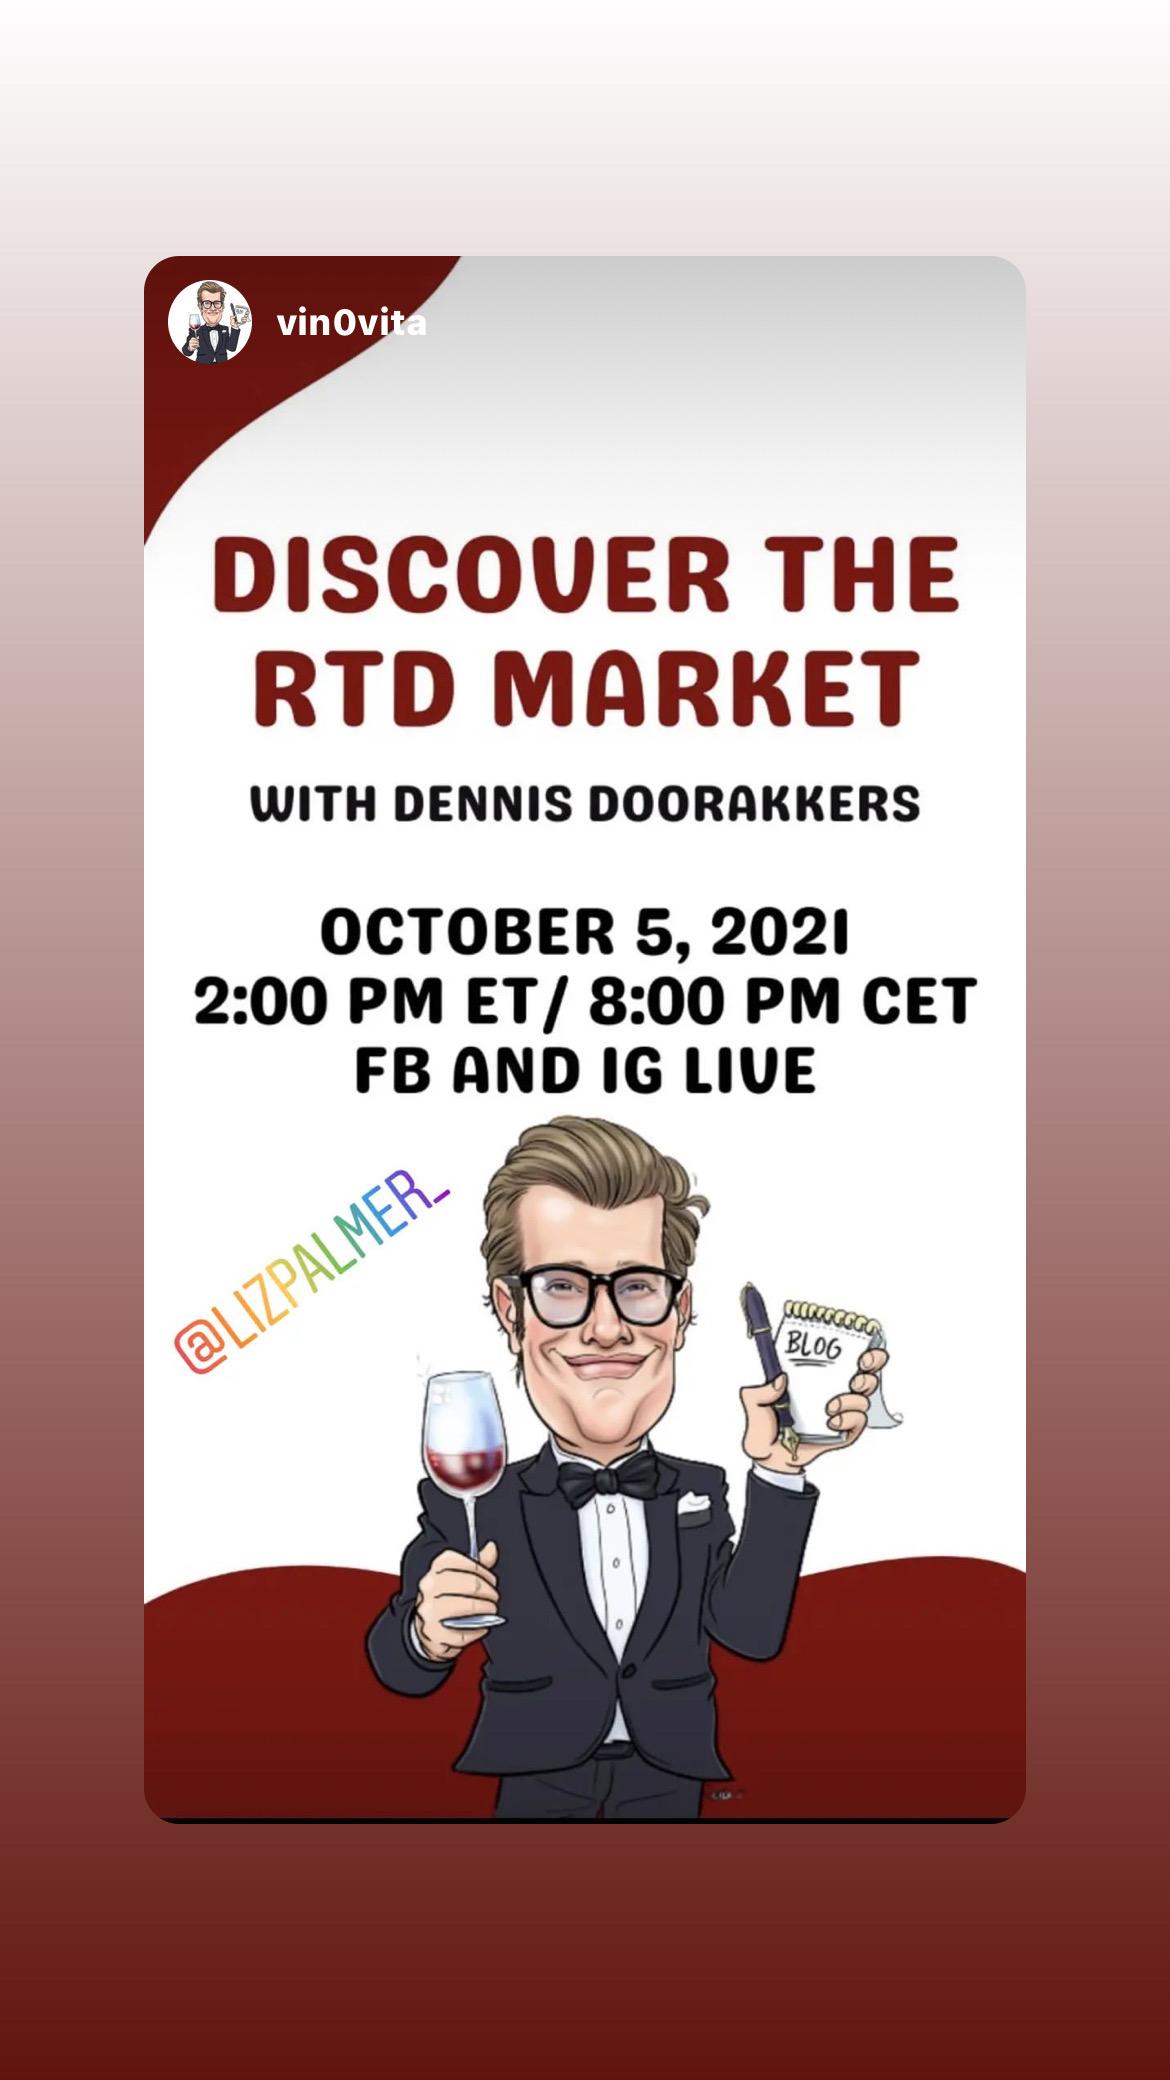 Discover the Fast-Growing RTD Market with Dennis Doorakkers [Oct 5 2 PM ET – IG Live @lizpalmer_]